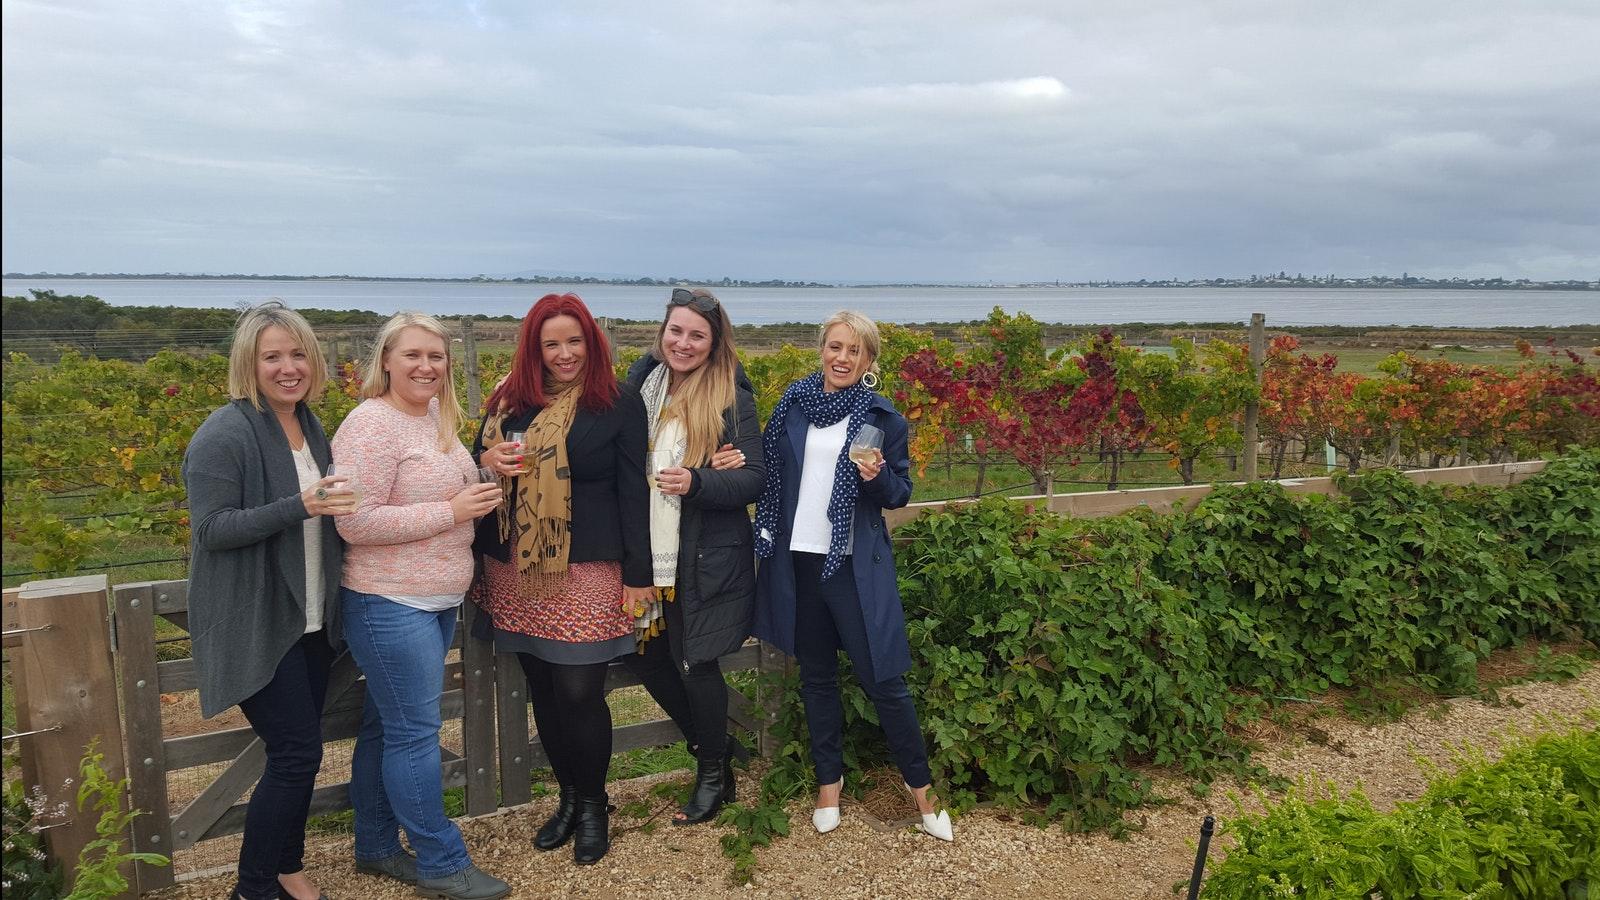 Girls enjoying a vino at Bails Farm